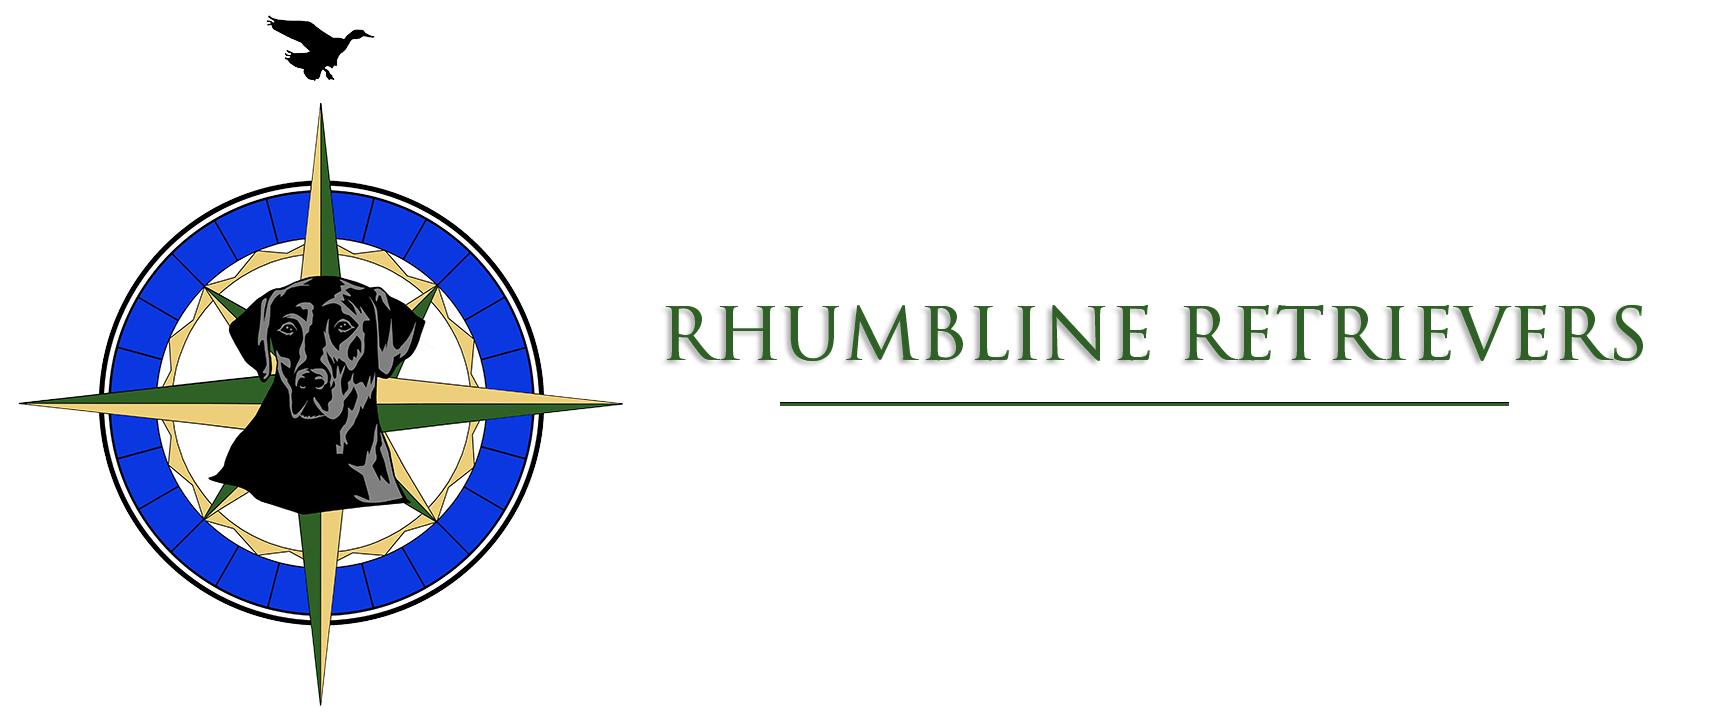 Rhumbline Retrievers